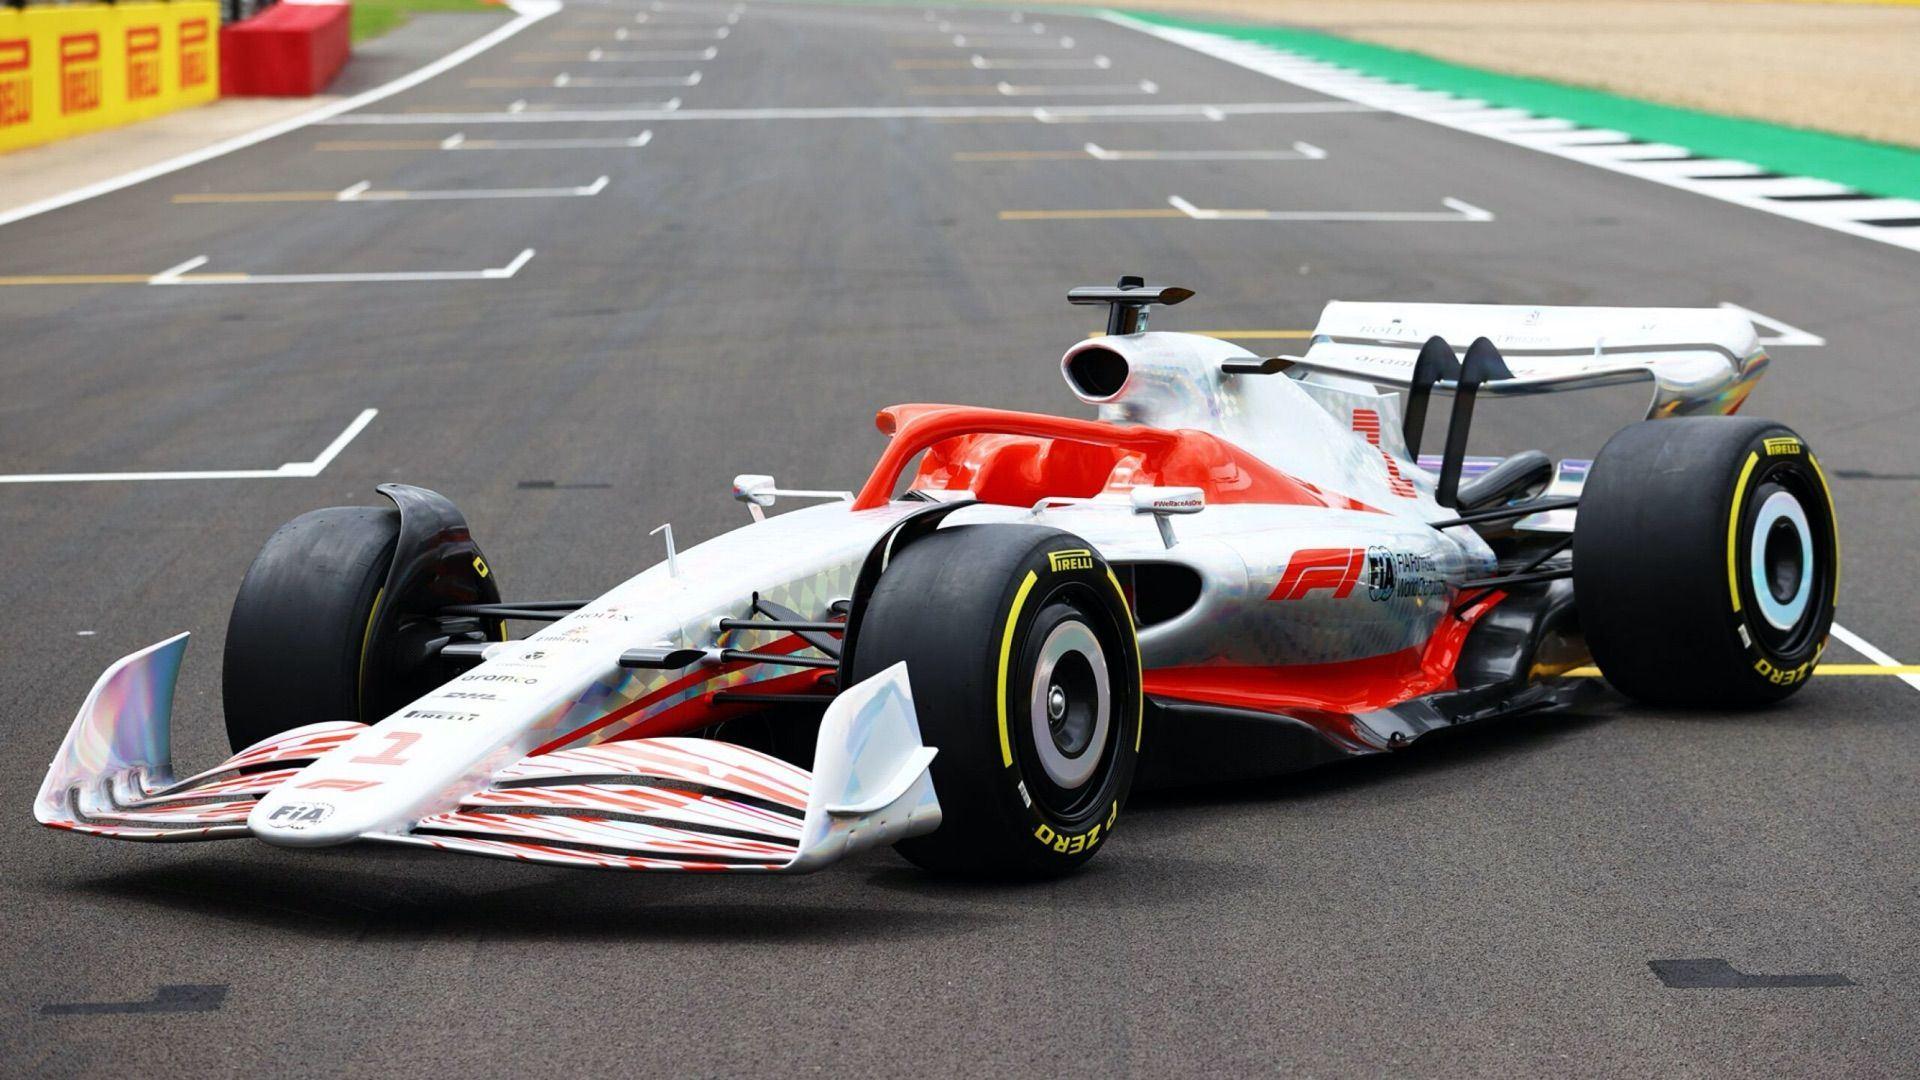 F1-Formula-1-car-2022-2_1920x1080